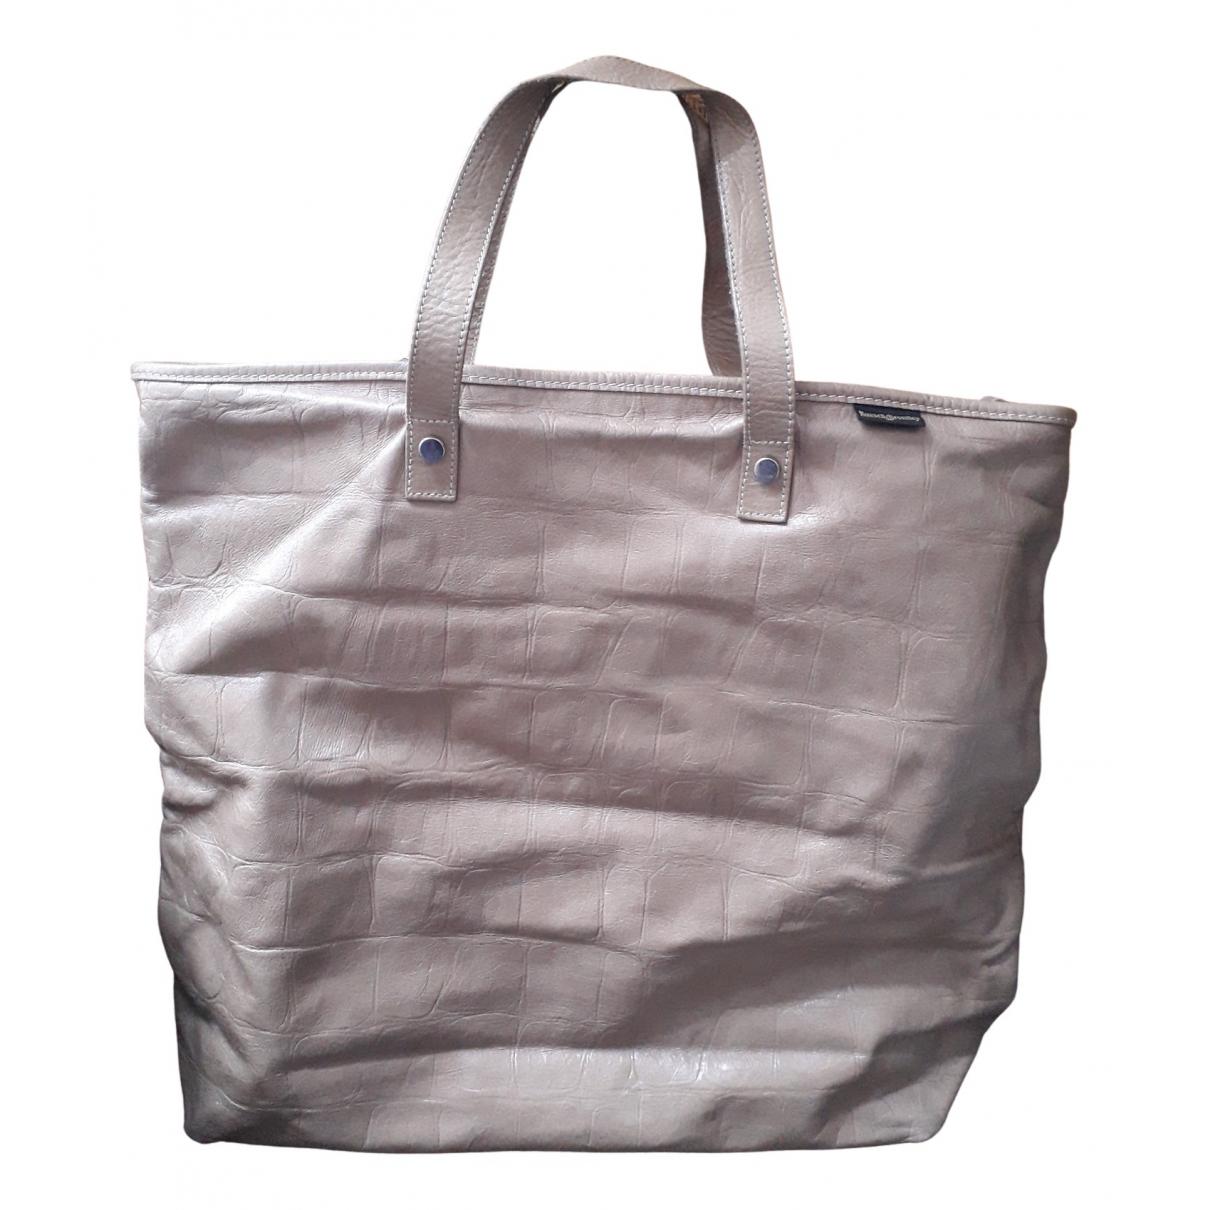 Russell & Bromley \N Handtasche in  Beige Leder